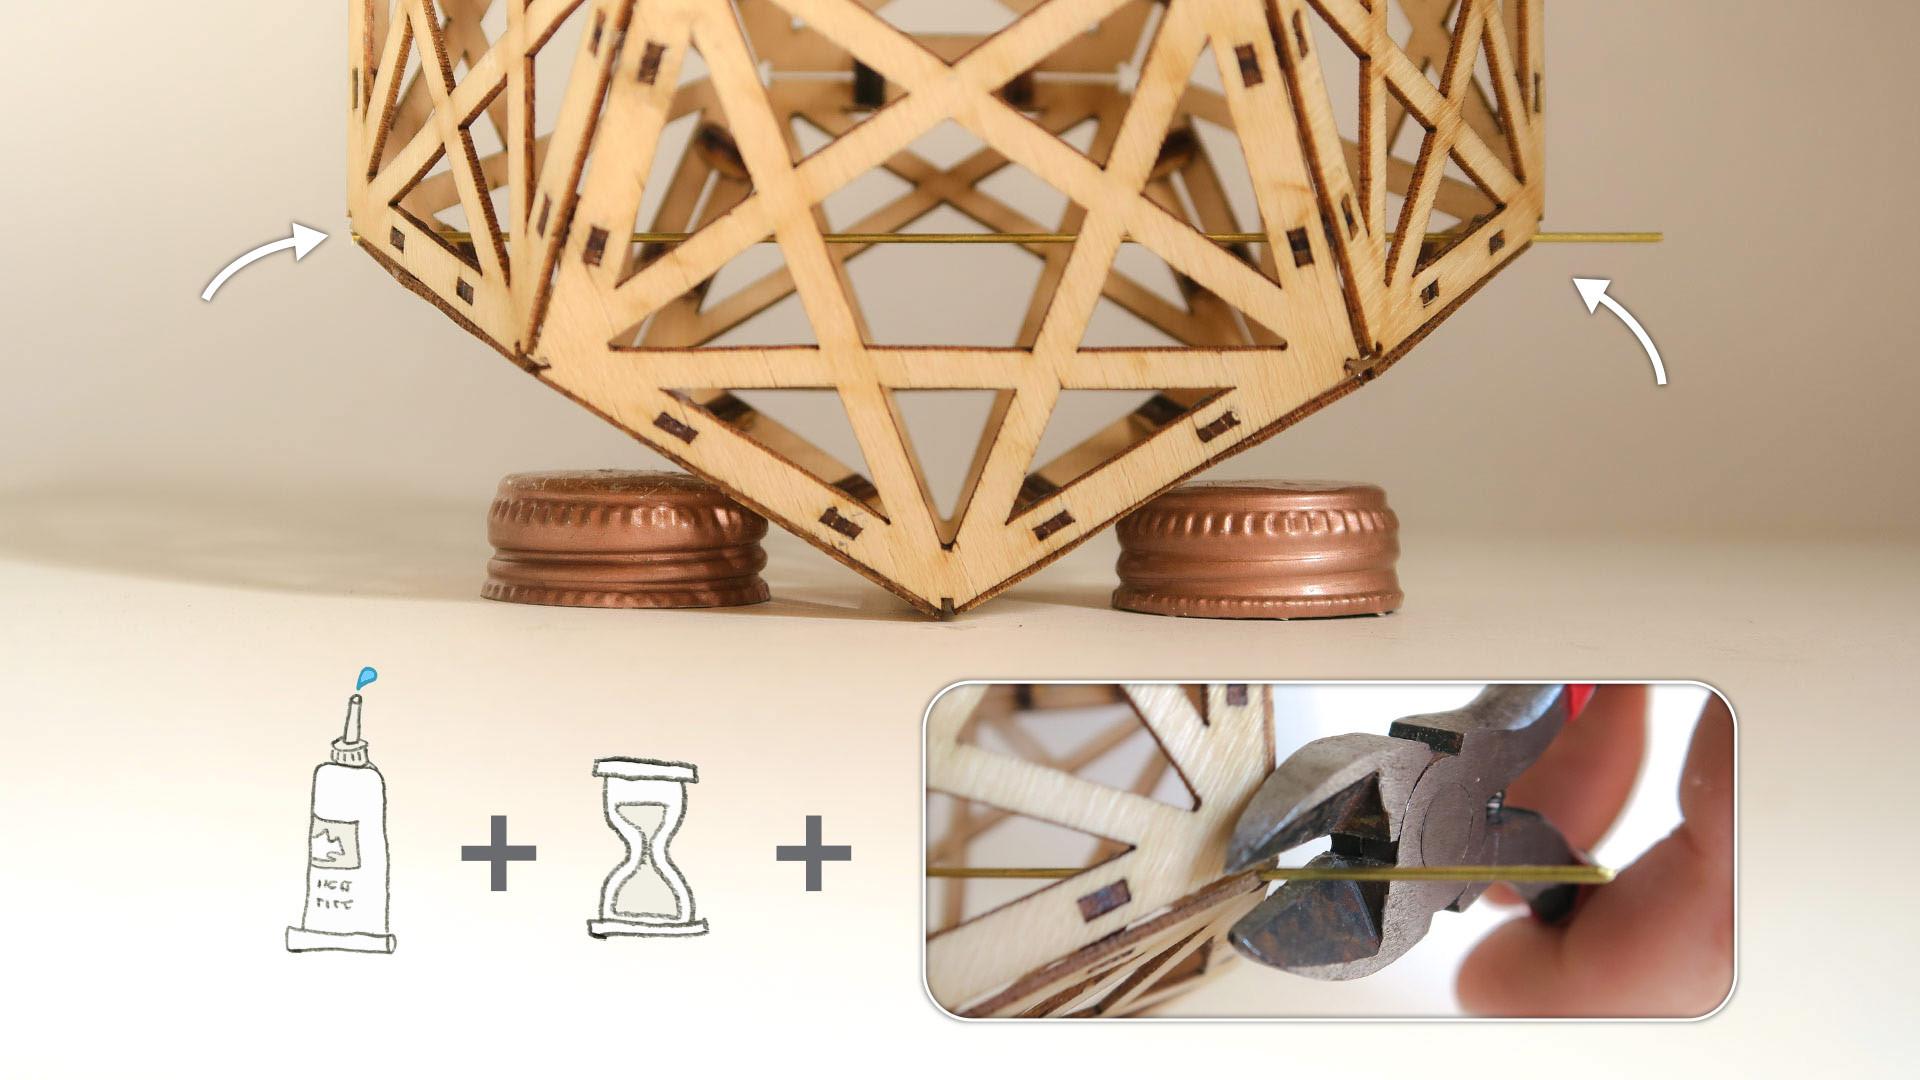 c15-DIY-instructions-picture-5.jpg